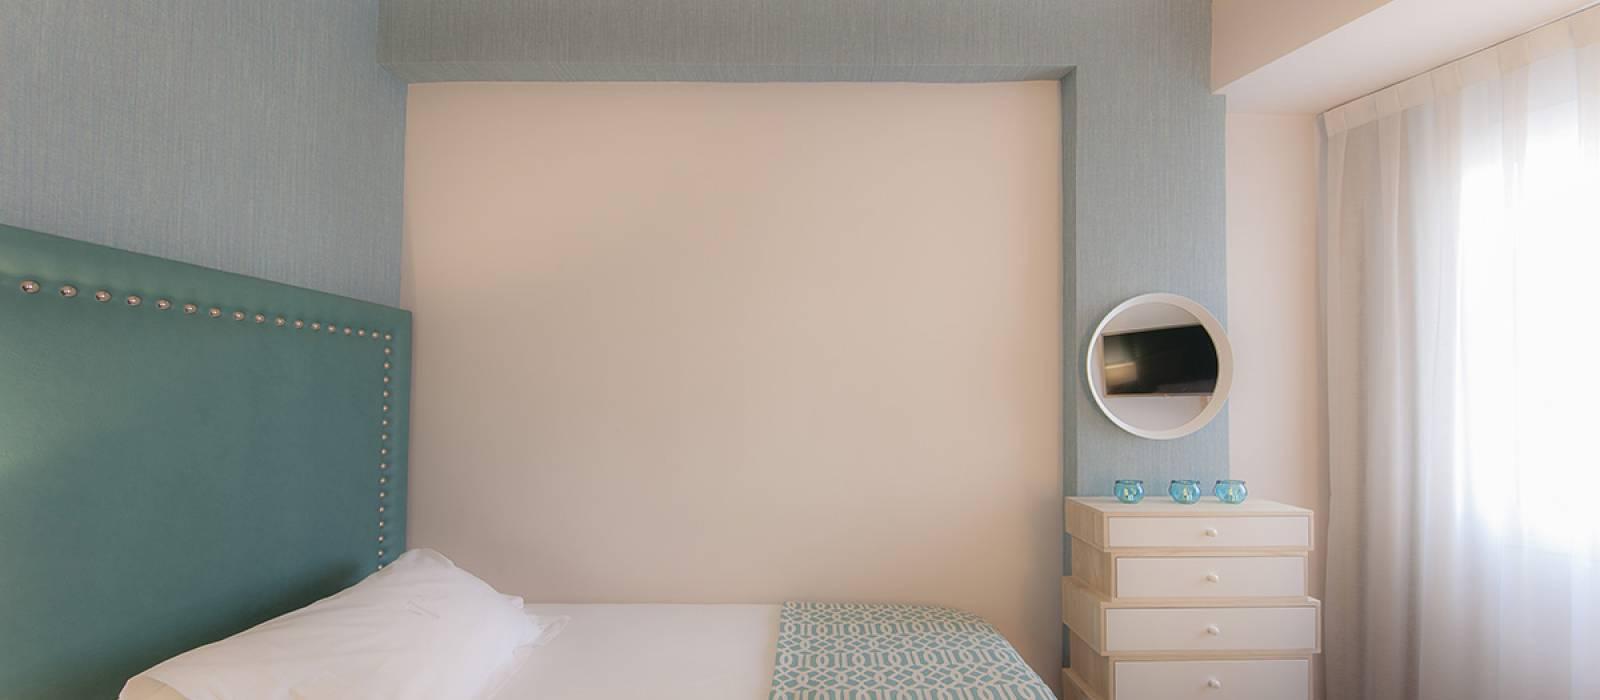 Soma Chambres Hôtel Madrid - Vincci Hoteles - Vincci XS